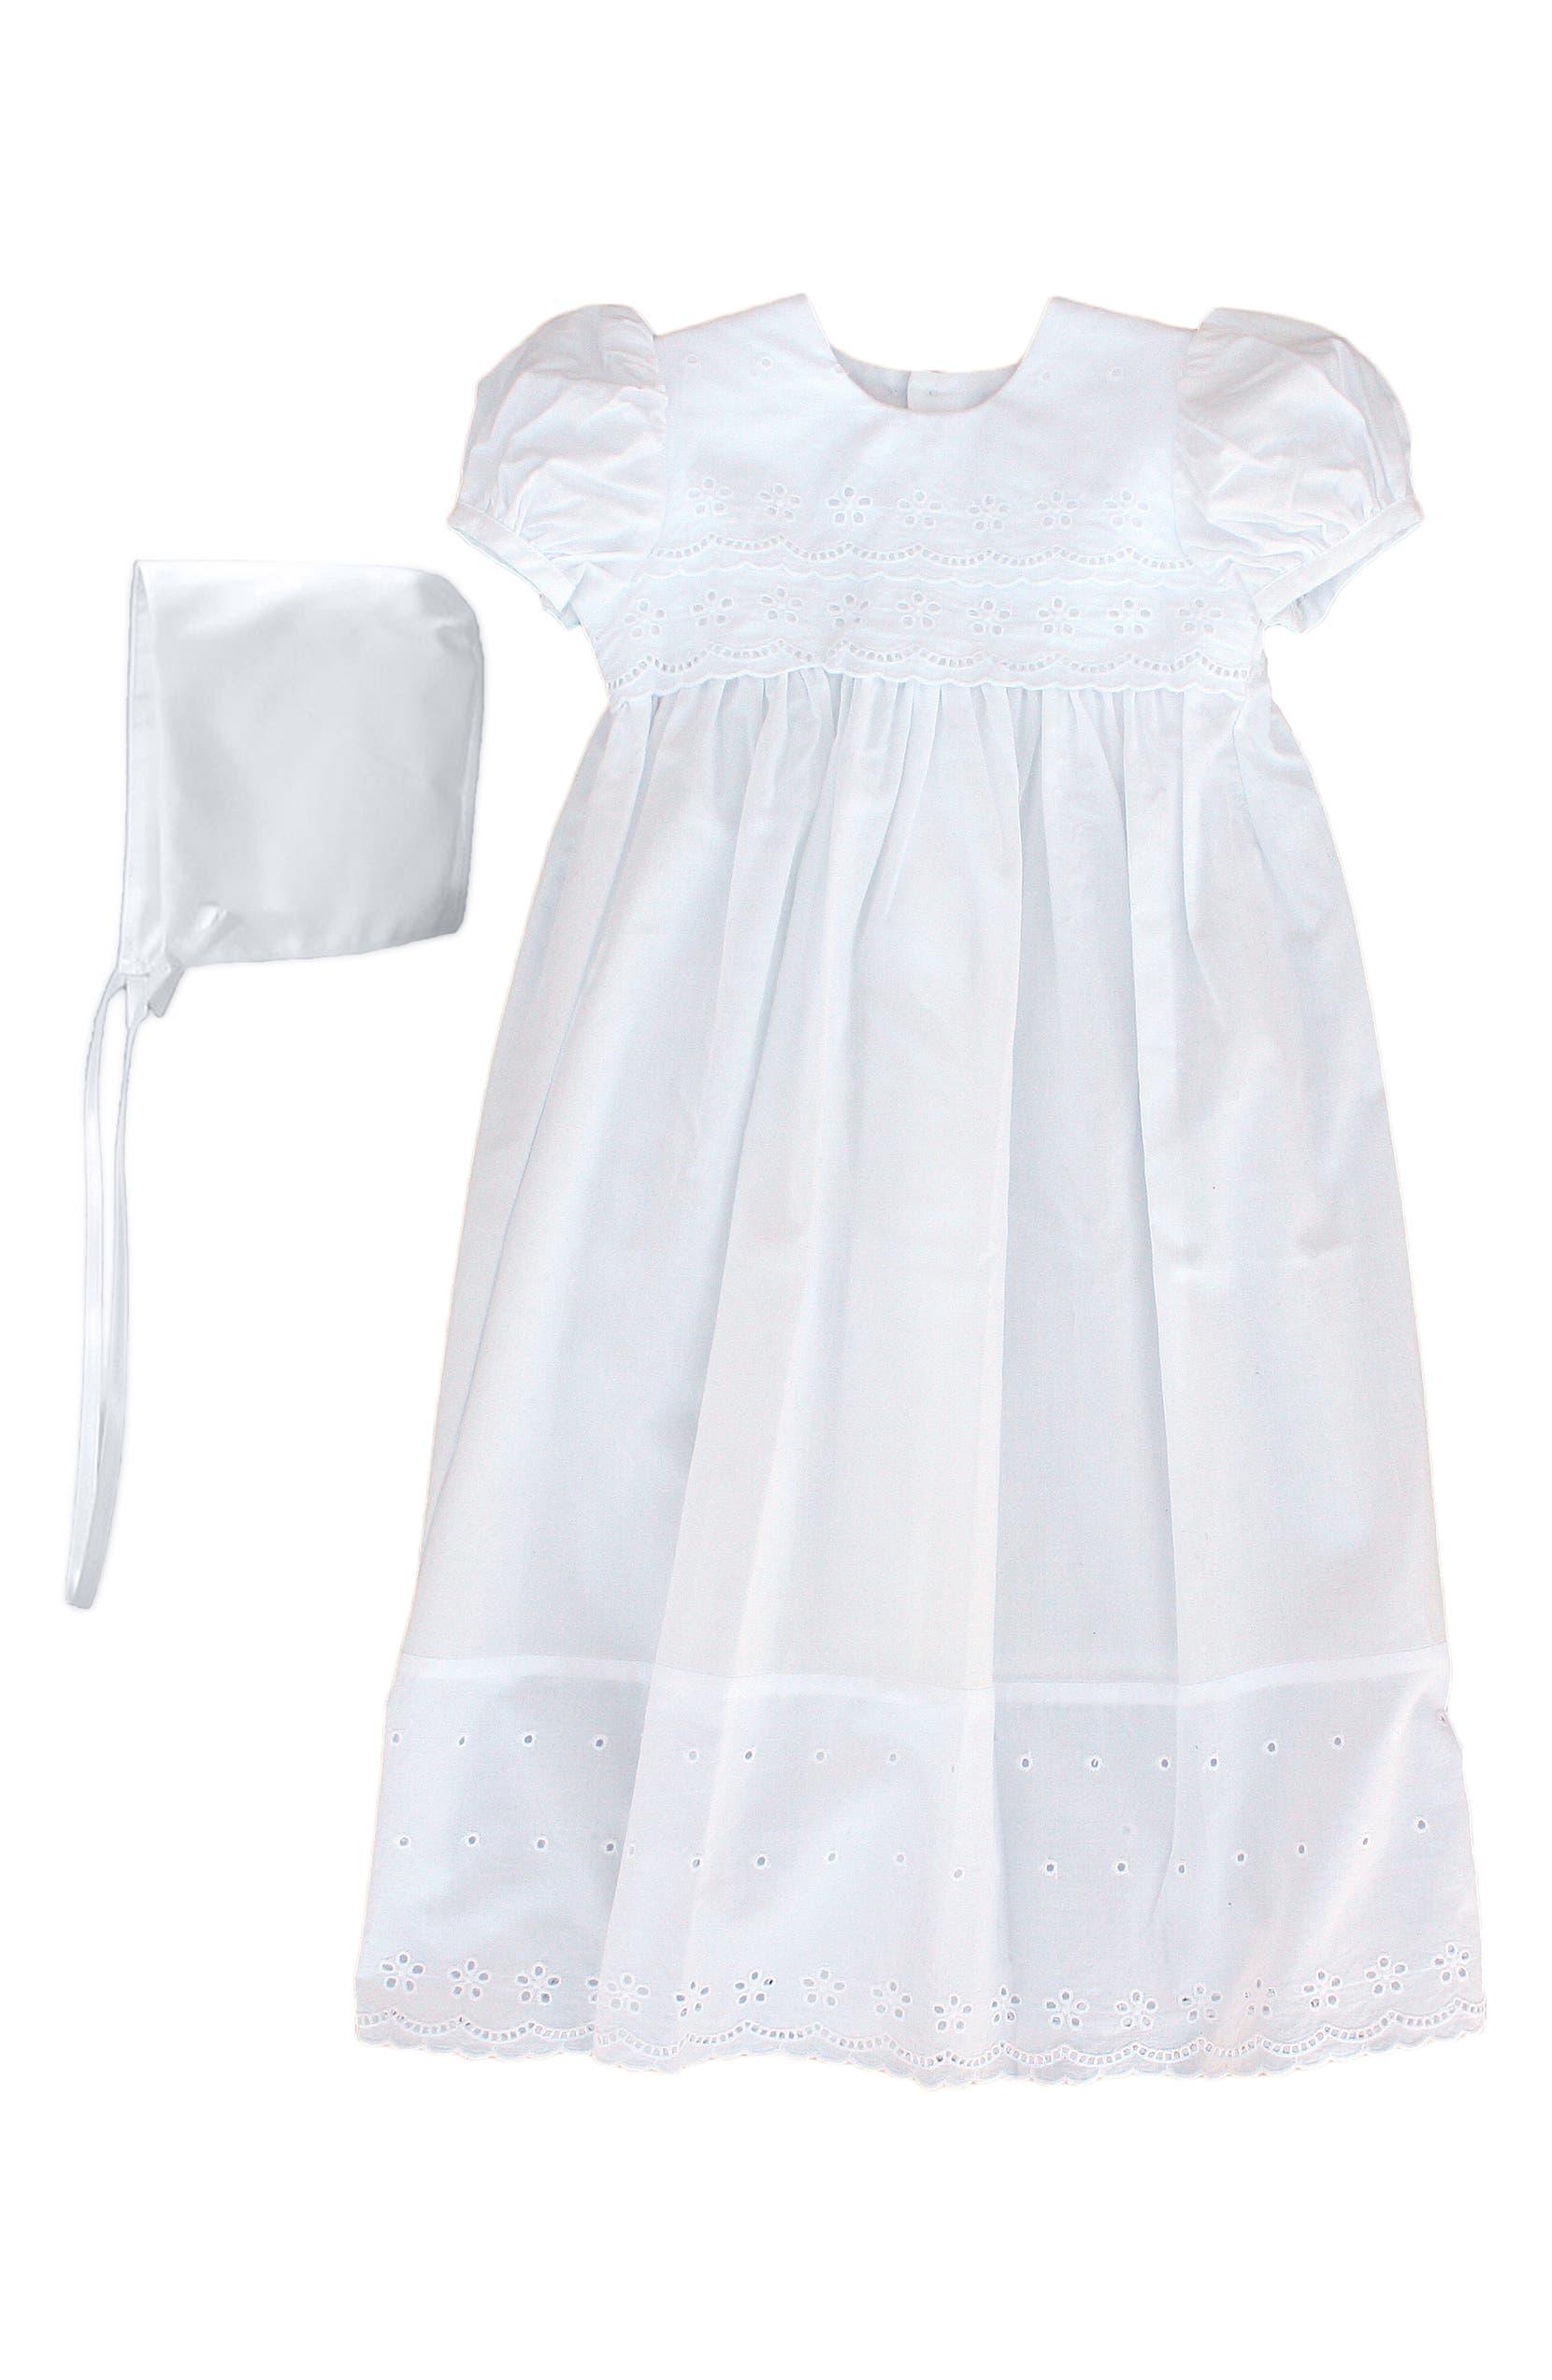 7ebc286f7abb0 Cotton Eyelet Christening Gown